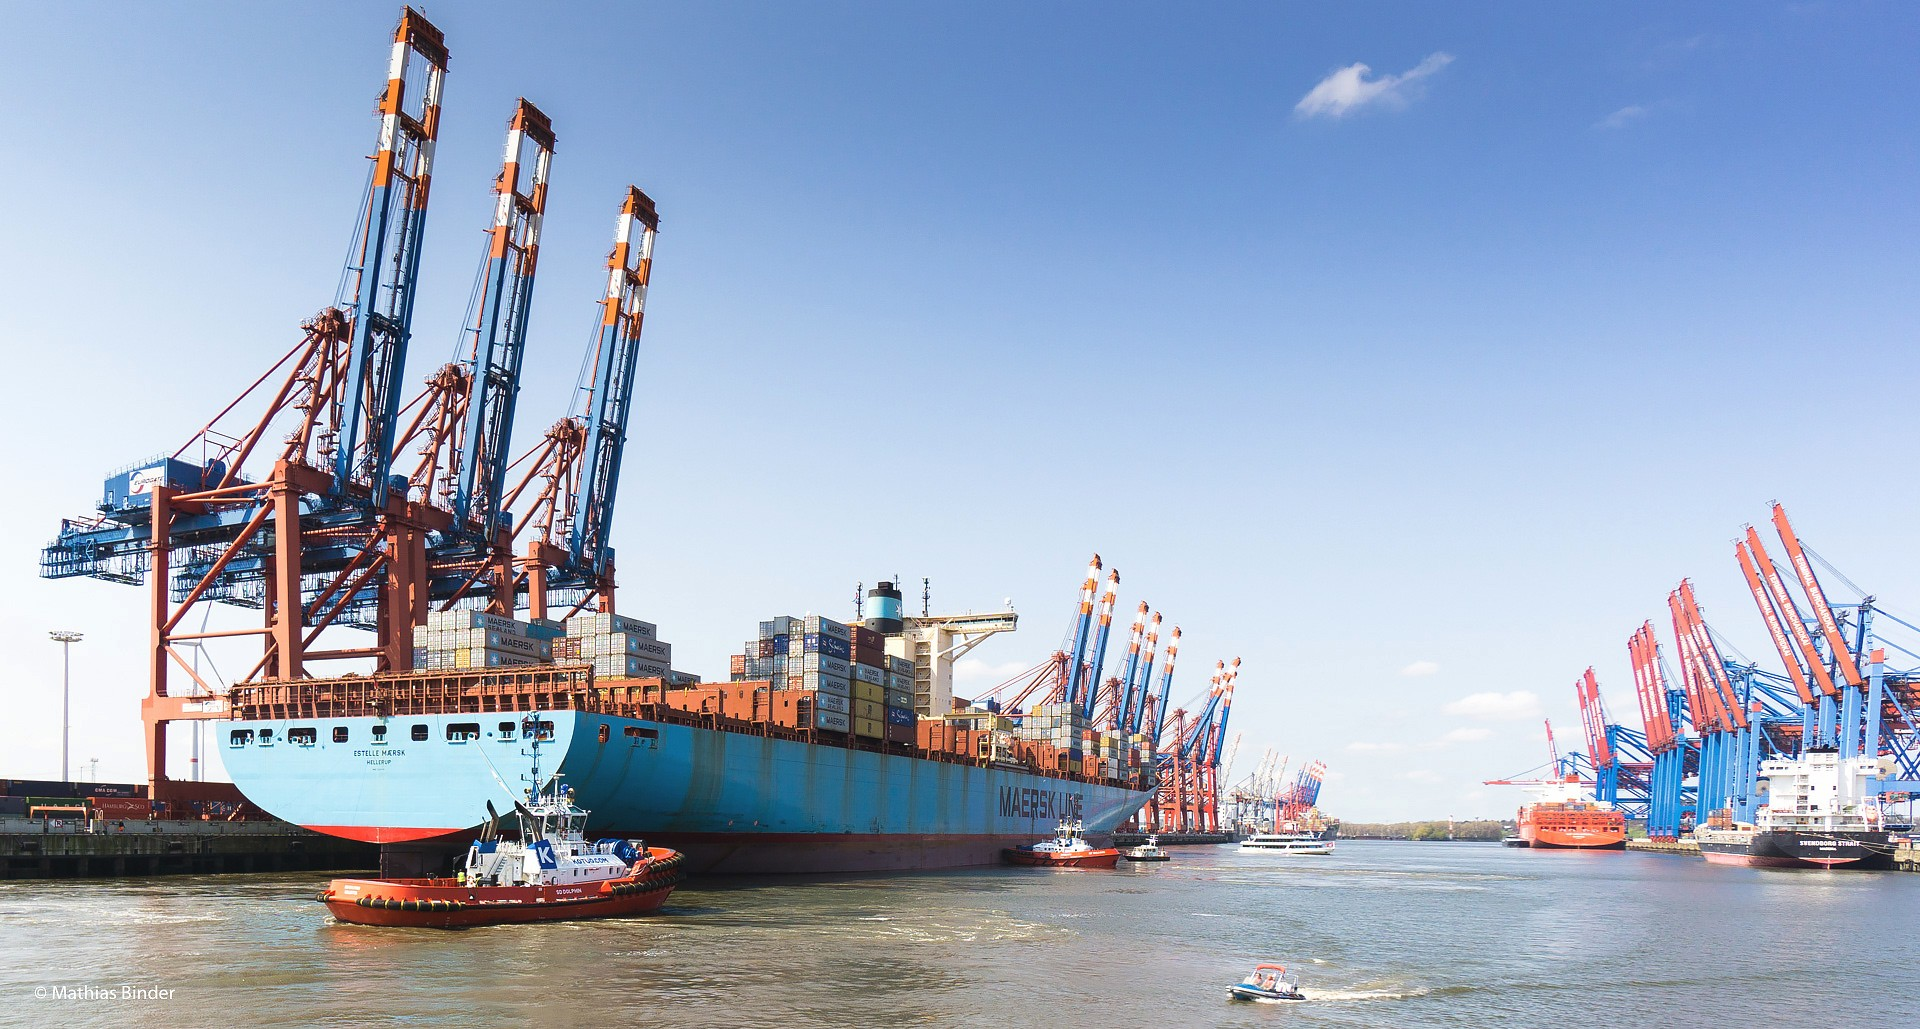 Ankunft Maersk Line Hamburg Eurogate